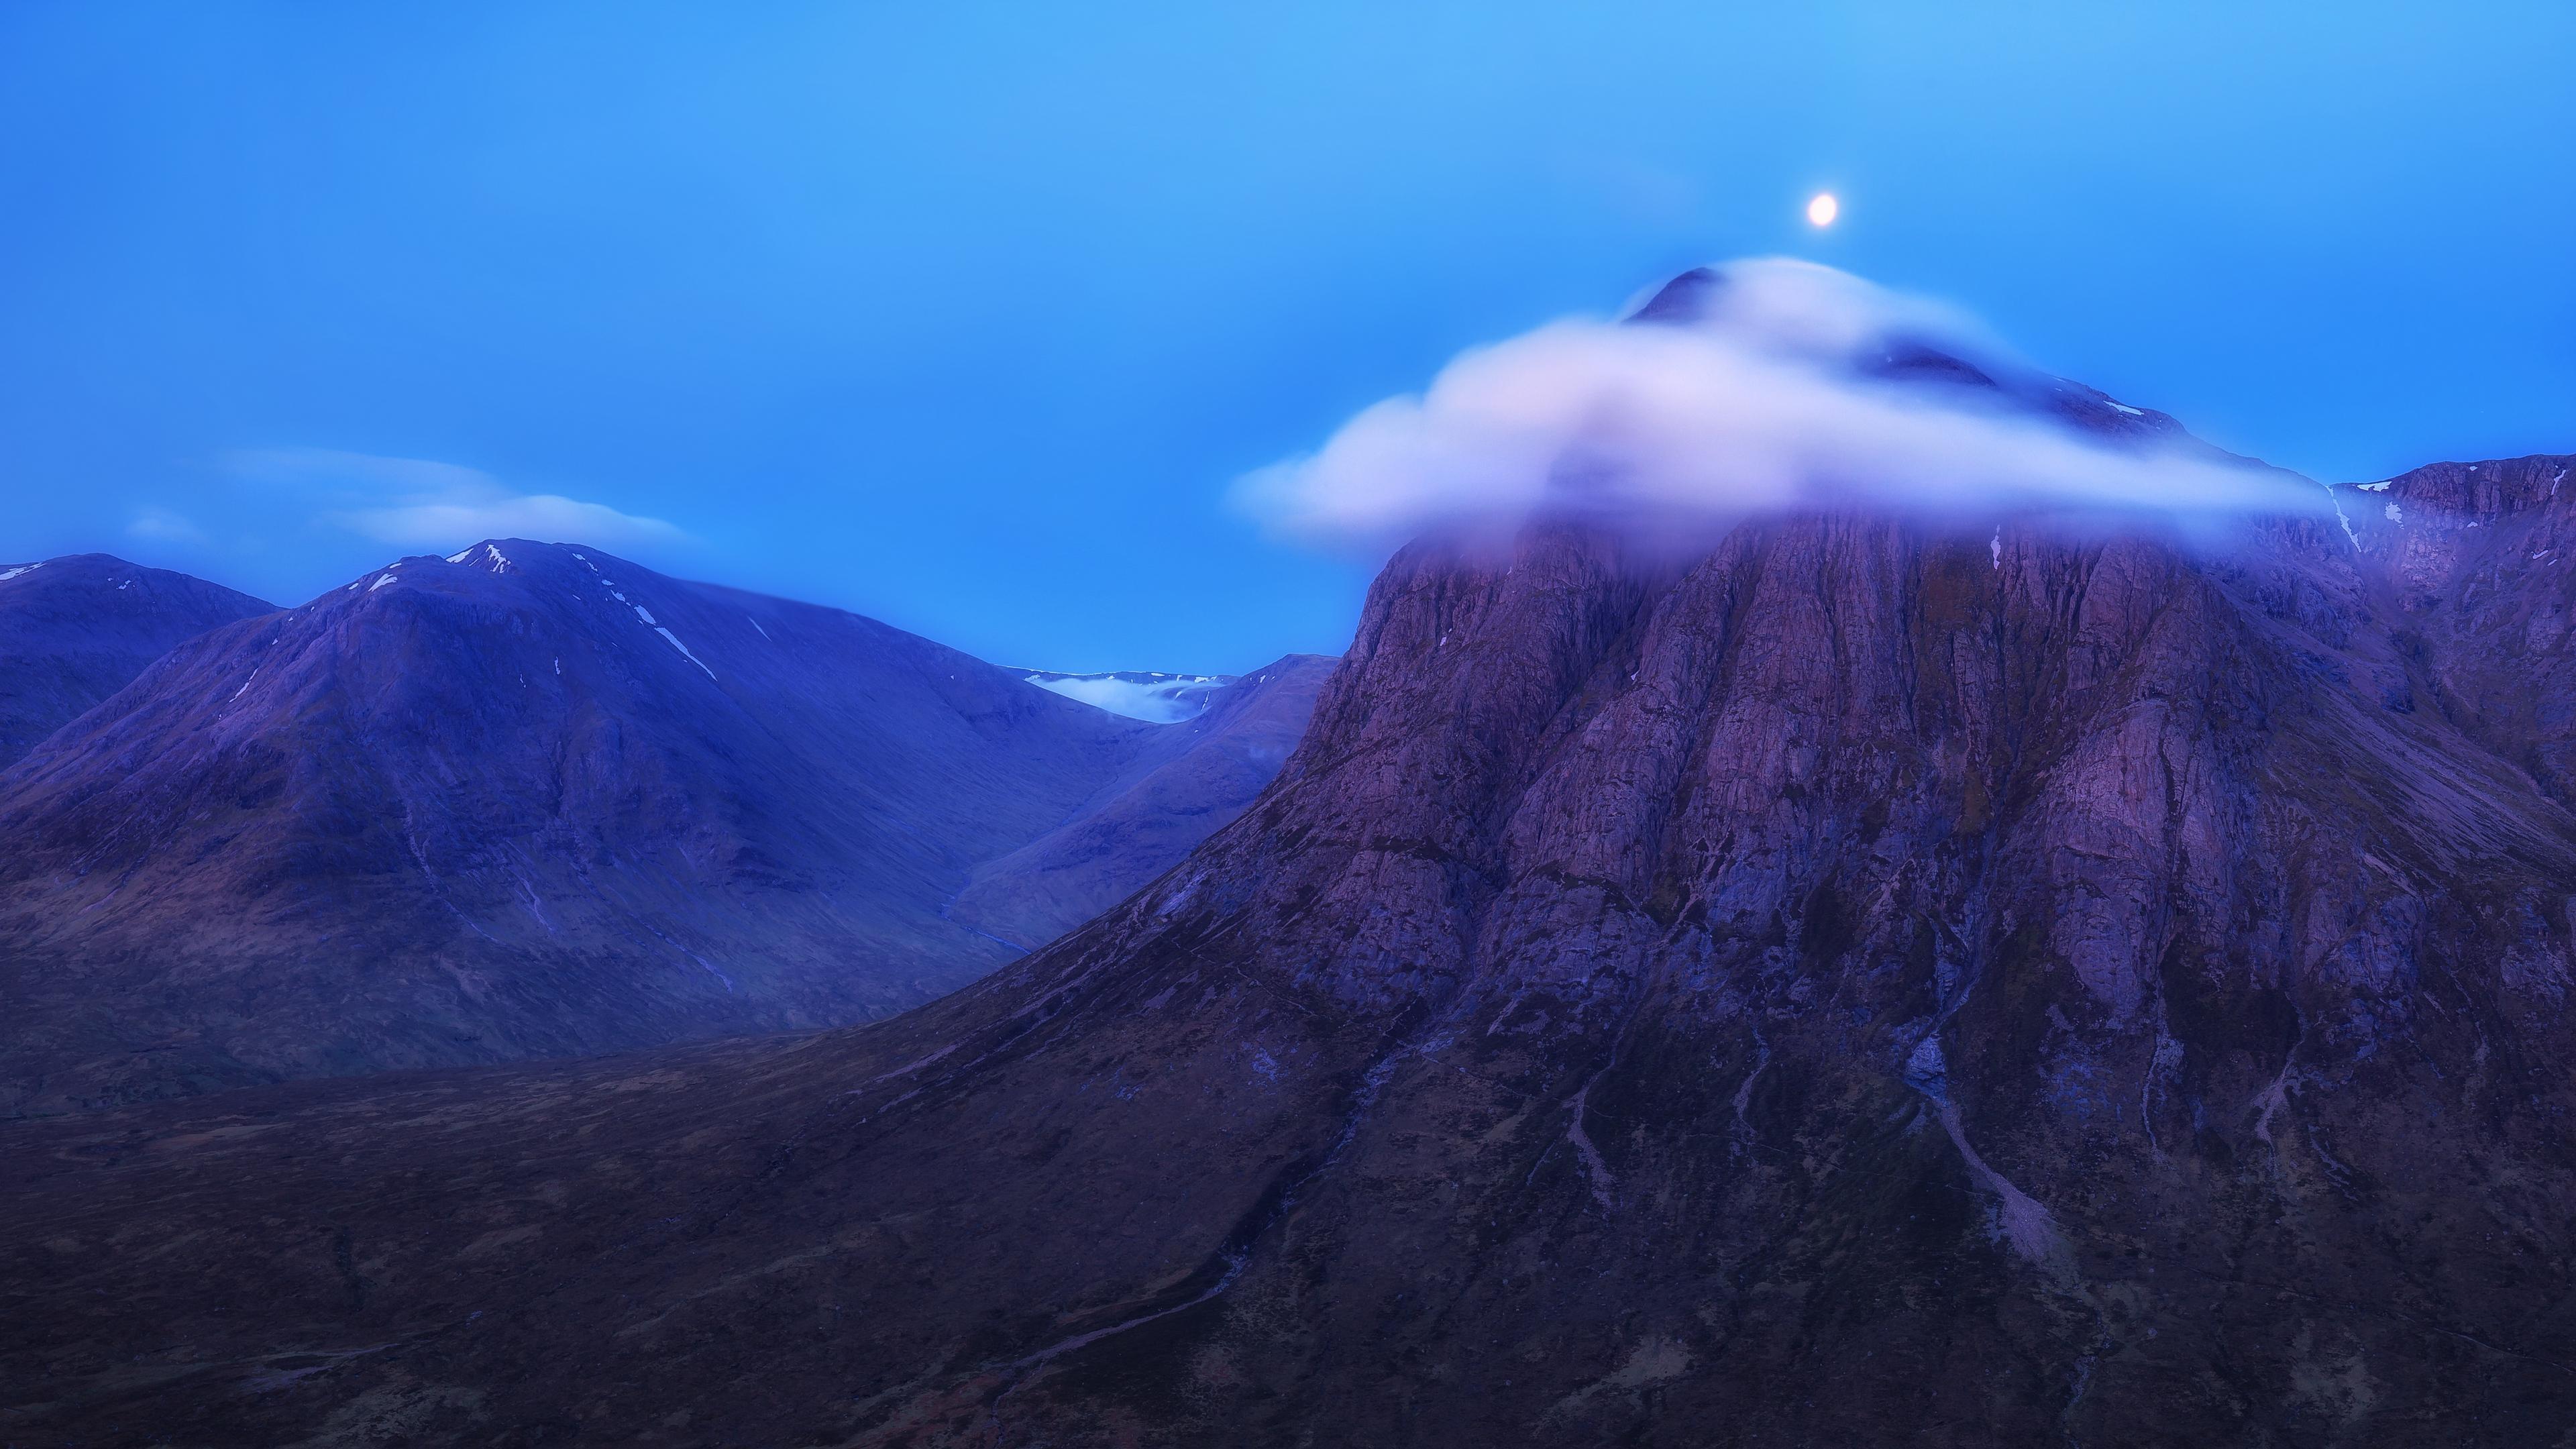 mountain peak scotland highlands 4k 1541117187 - mountain, peak, scotland, highlands 4k - Scotland, peak, Mountain